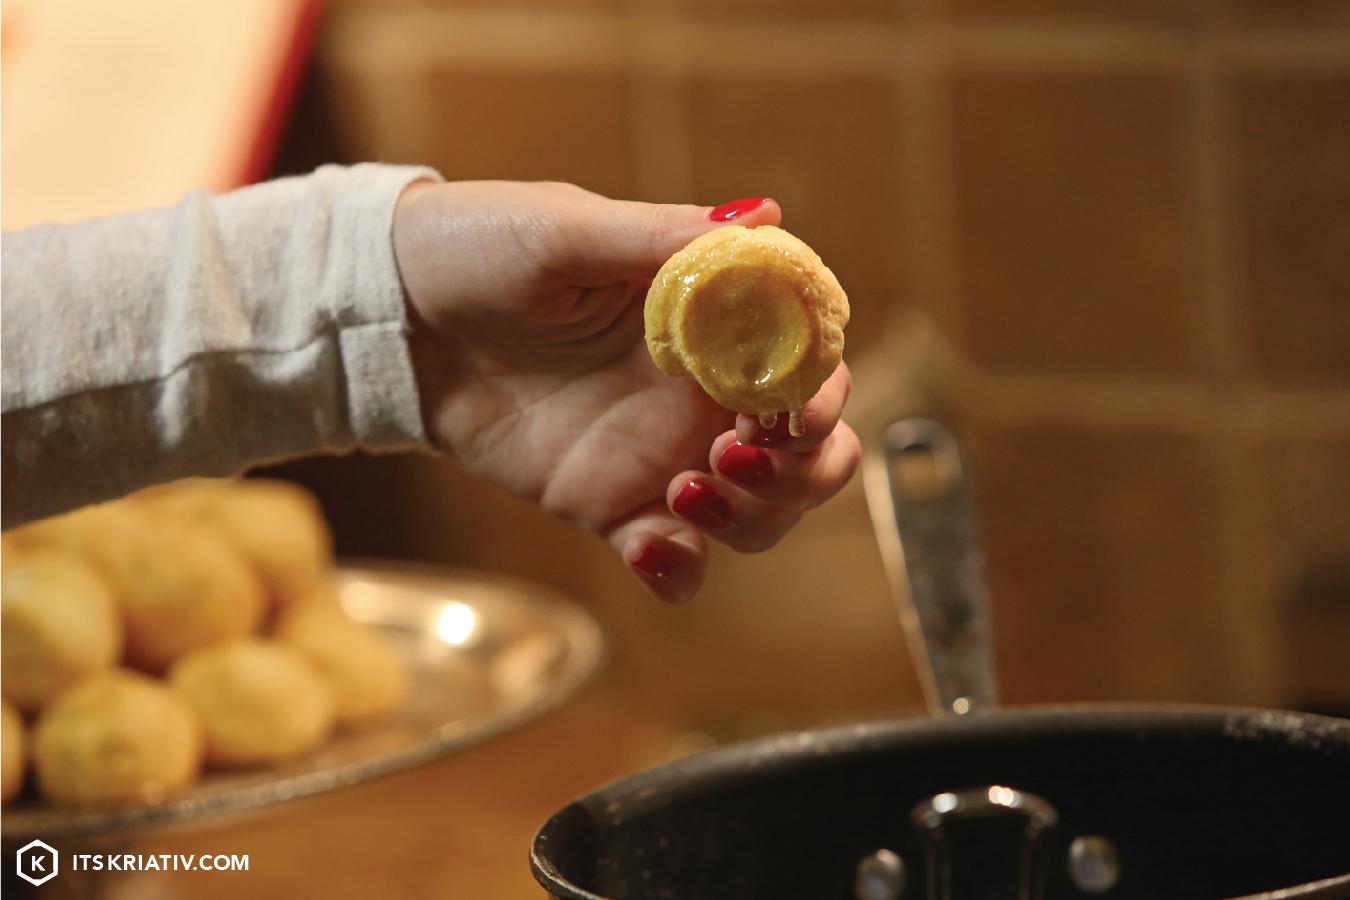 Its-Kriativ-Food-Holiday-Croquembouche-Dessert-Recipe.jpg